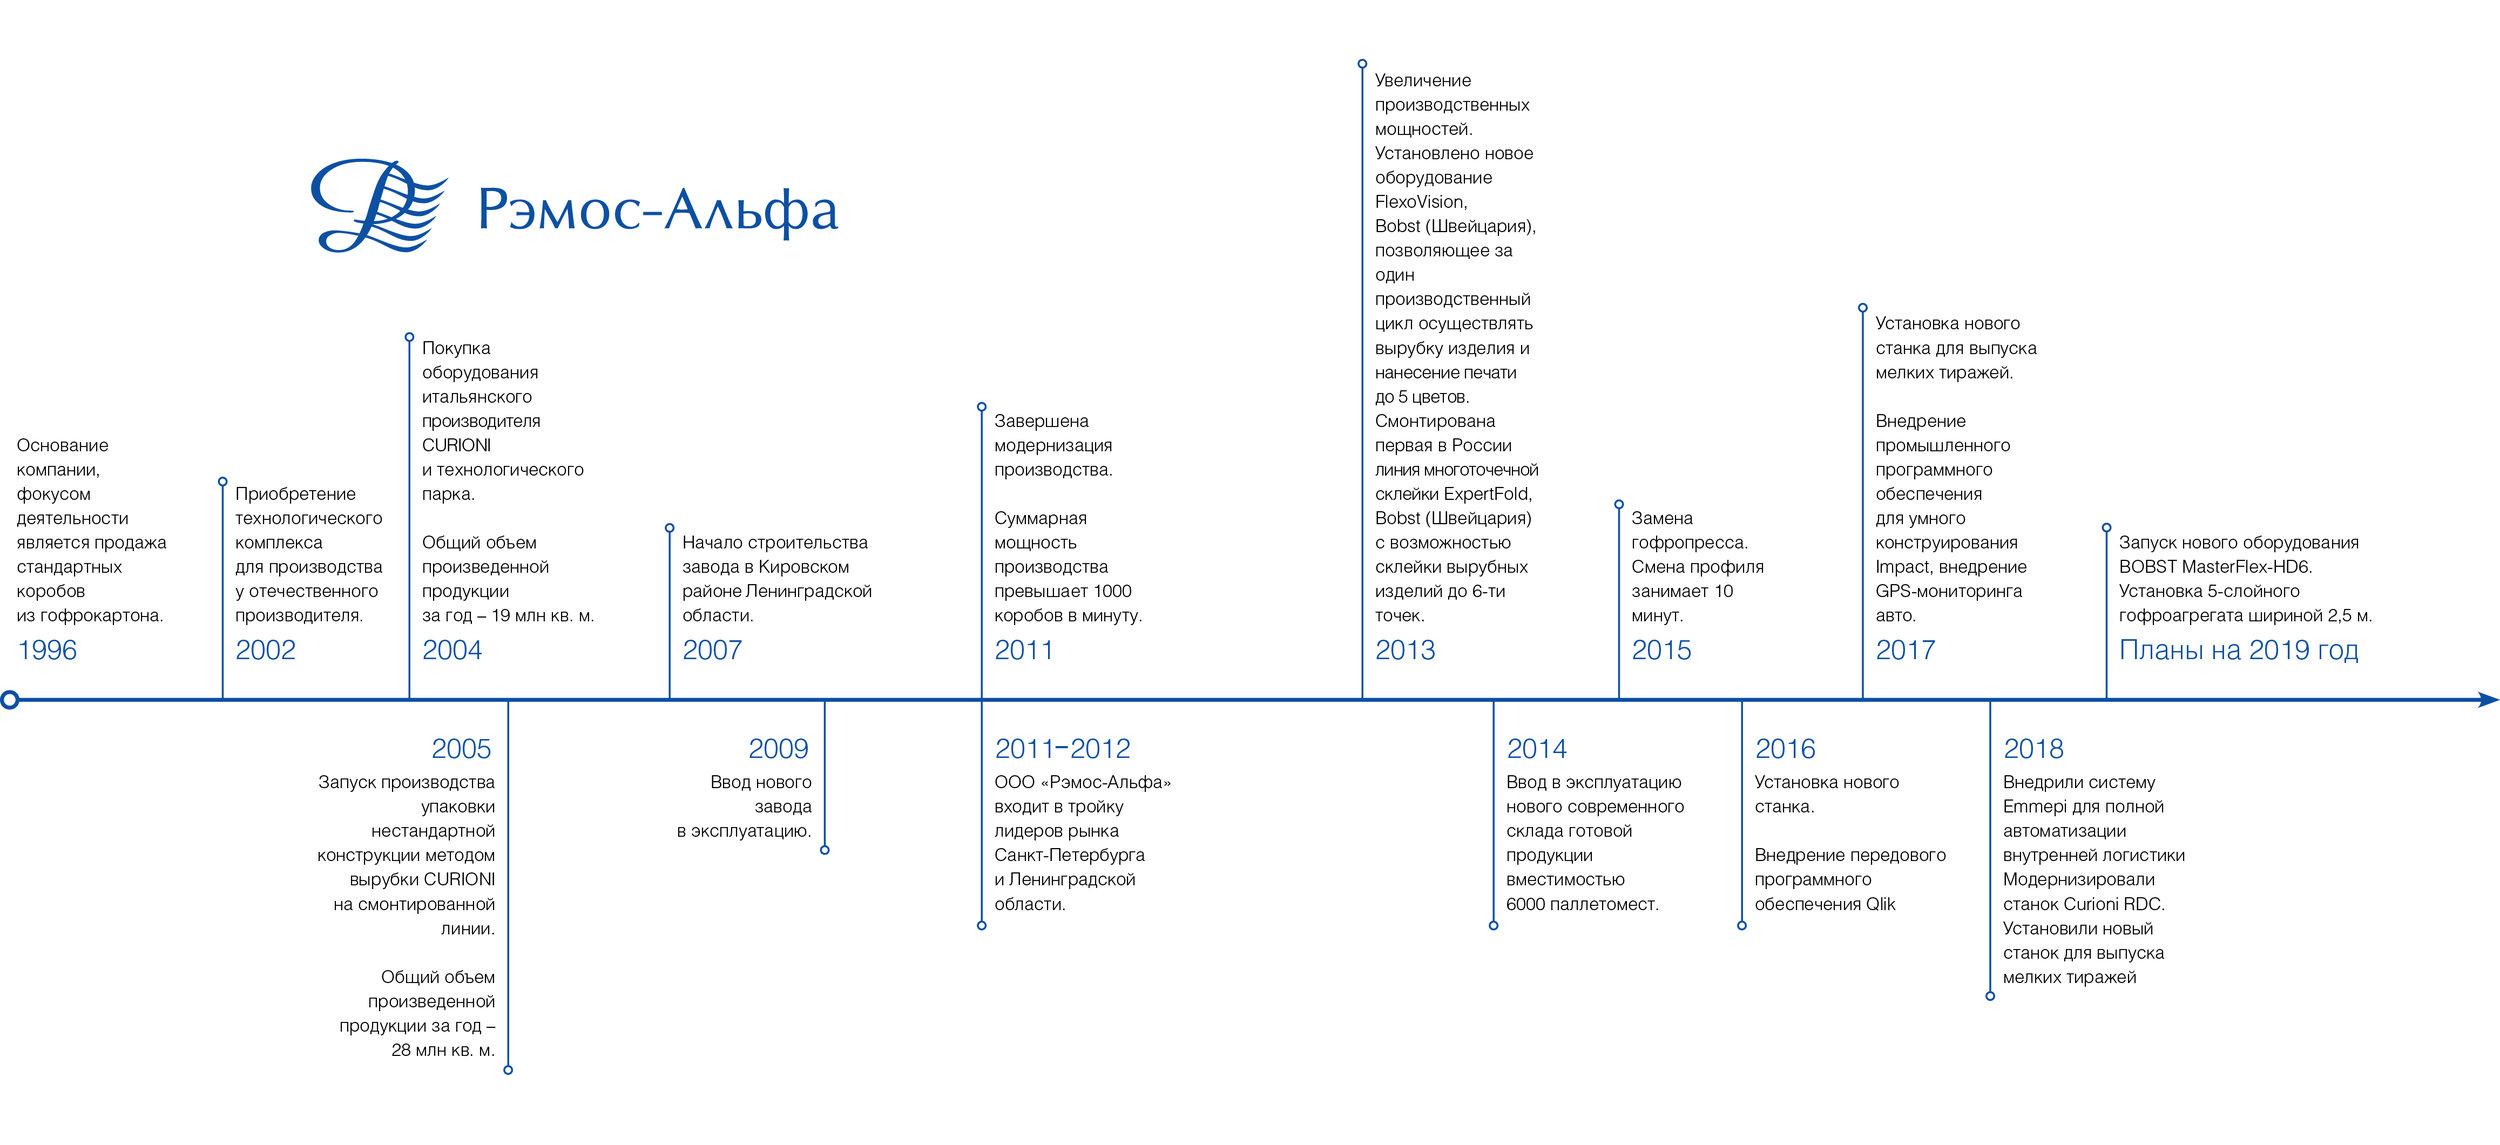 Remos_Alpha_Brochure RU 2019 история компании. jpg.jpg